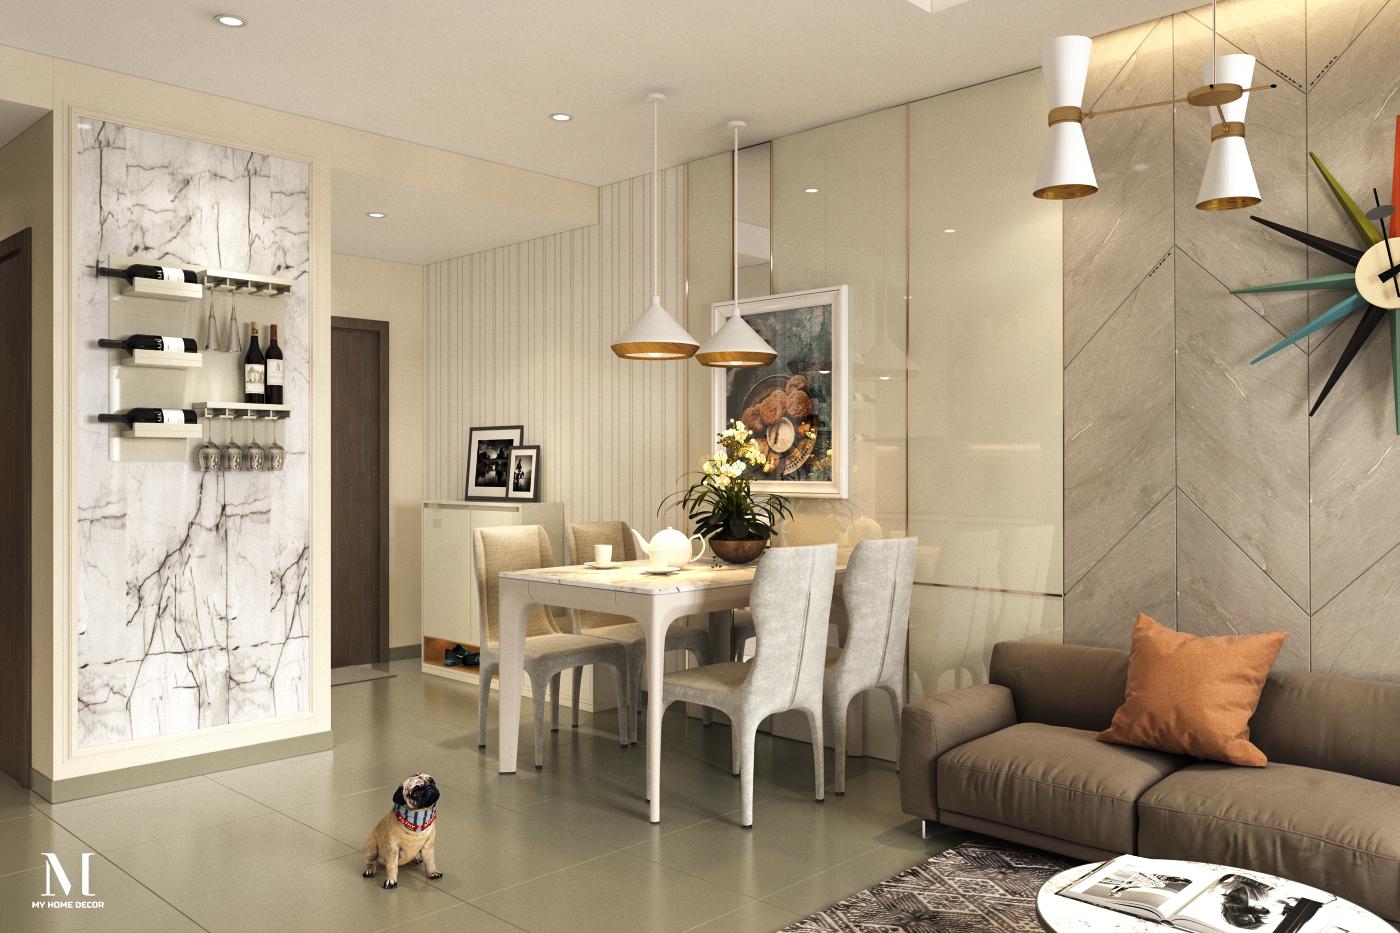 Thiết kế kiến trúc & nội thất